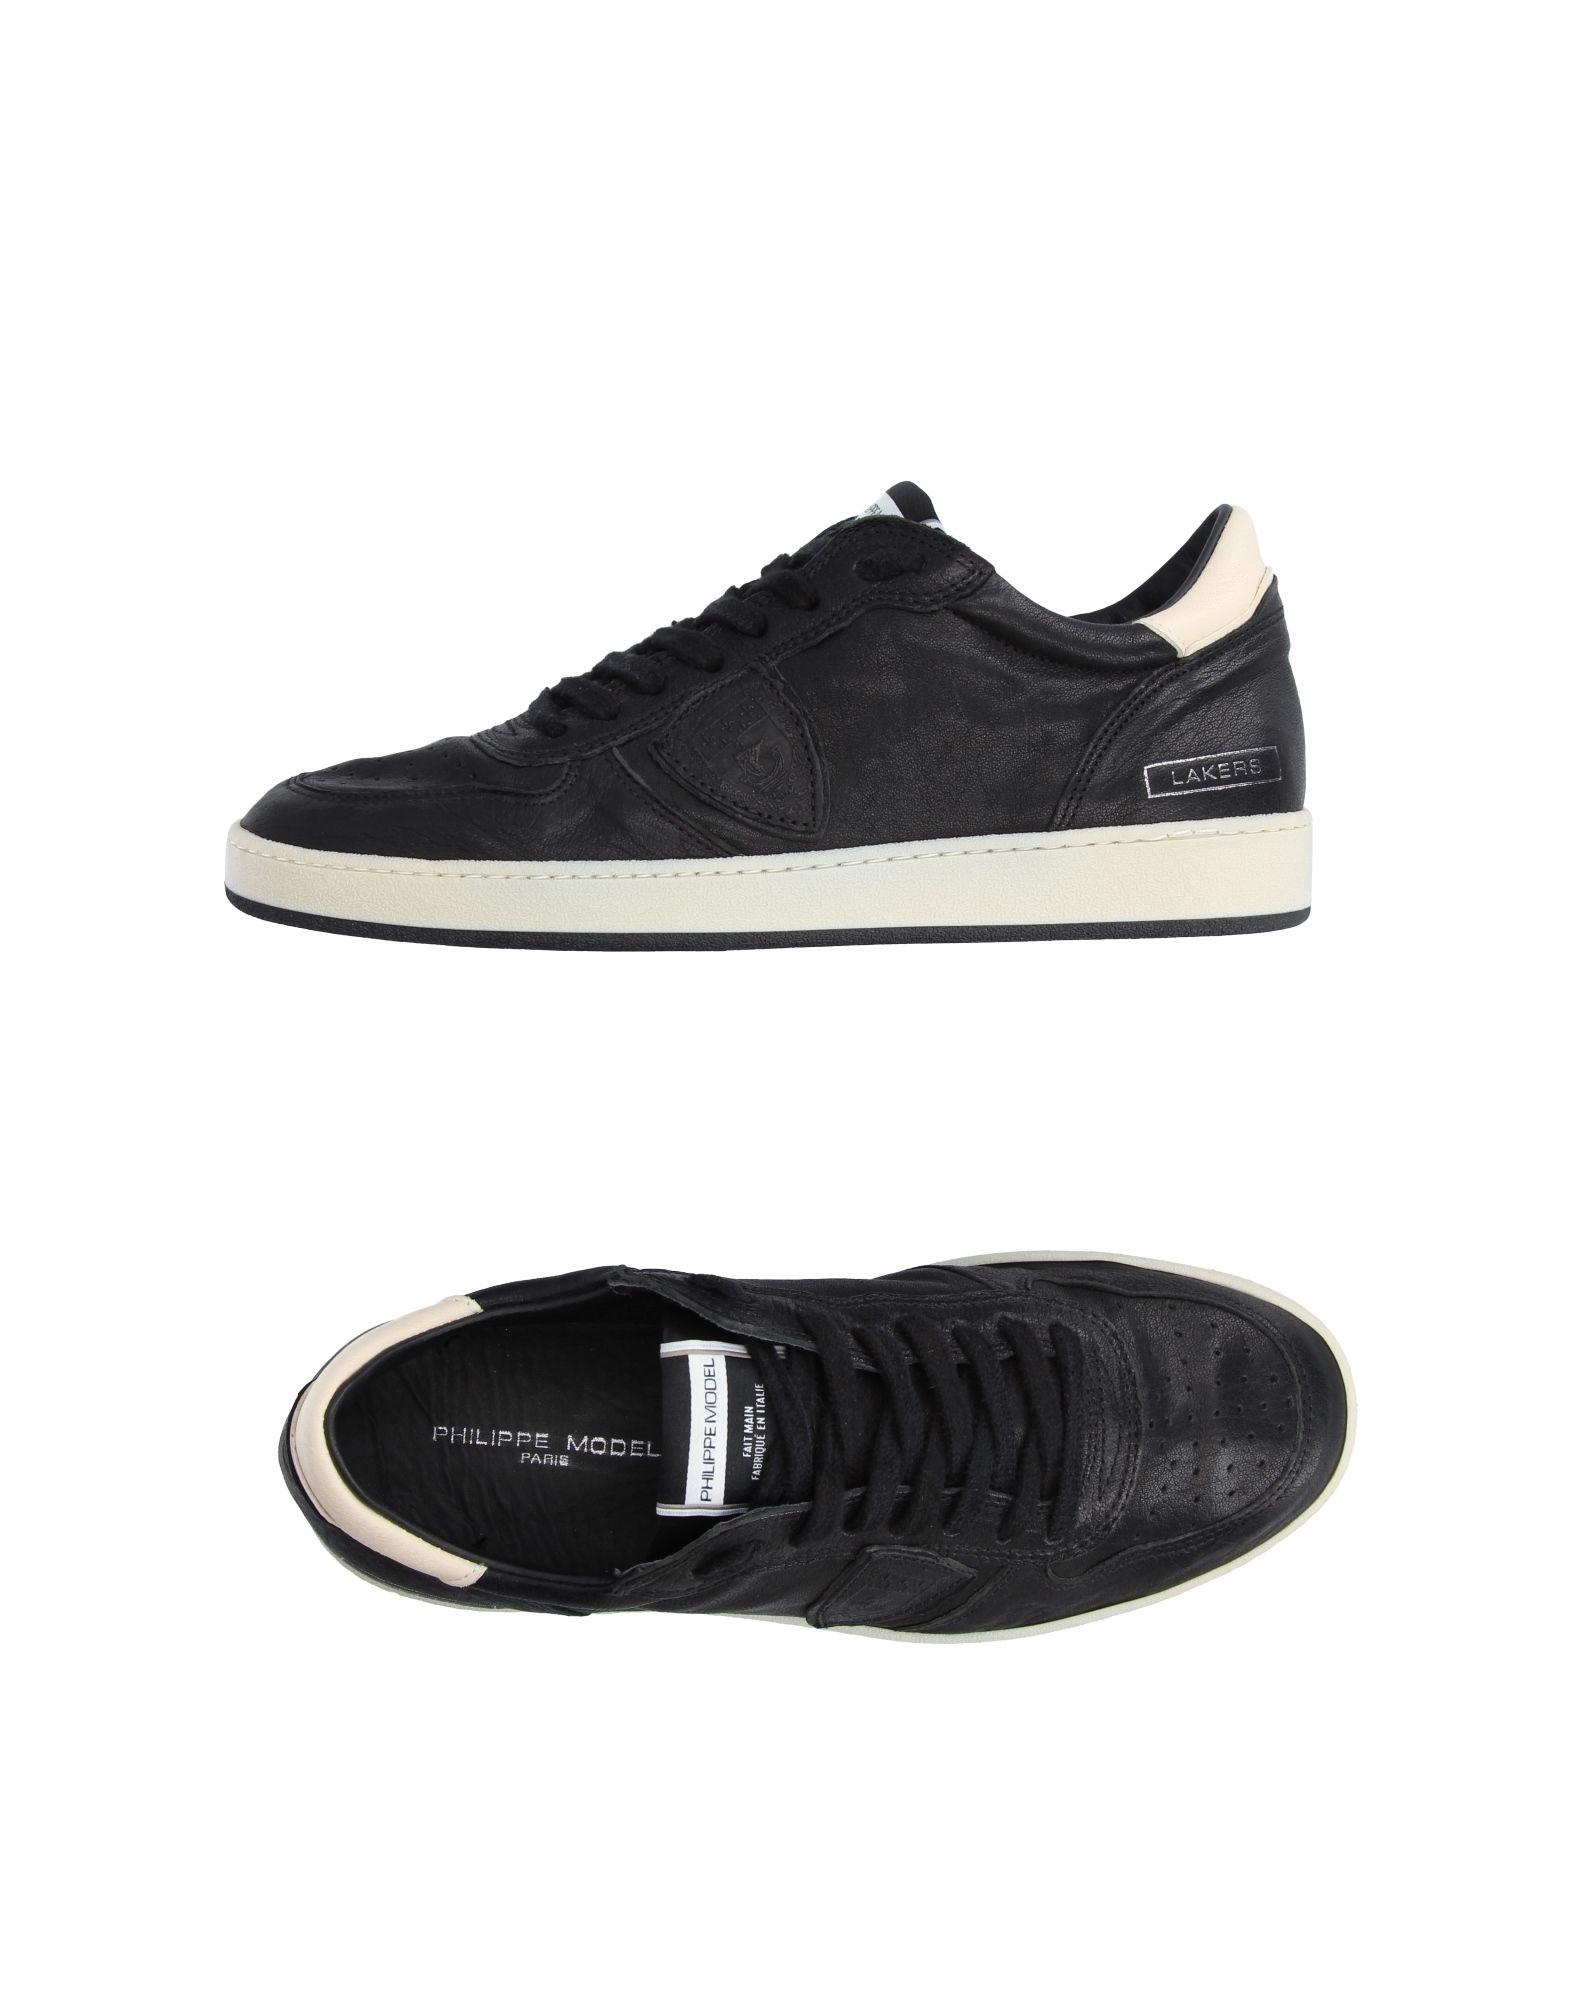 'PHILIPPE MODEL Sneakers